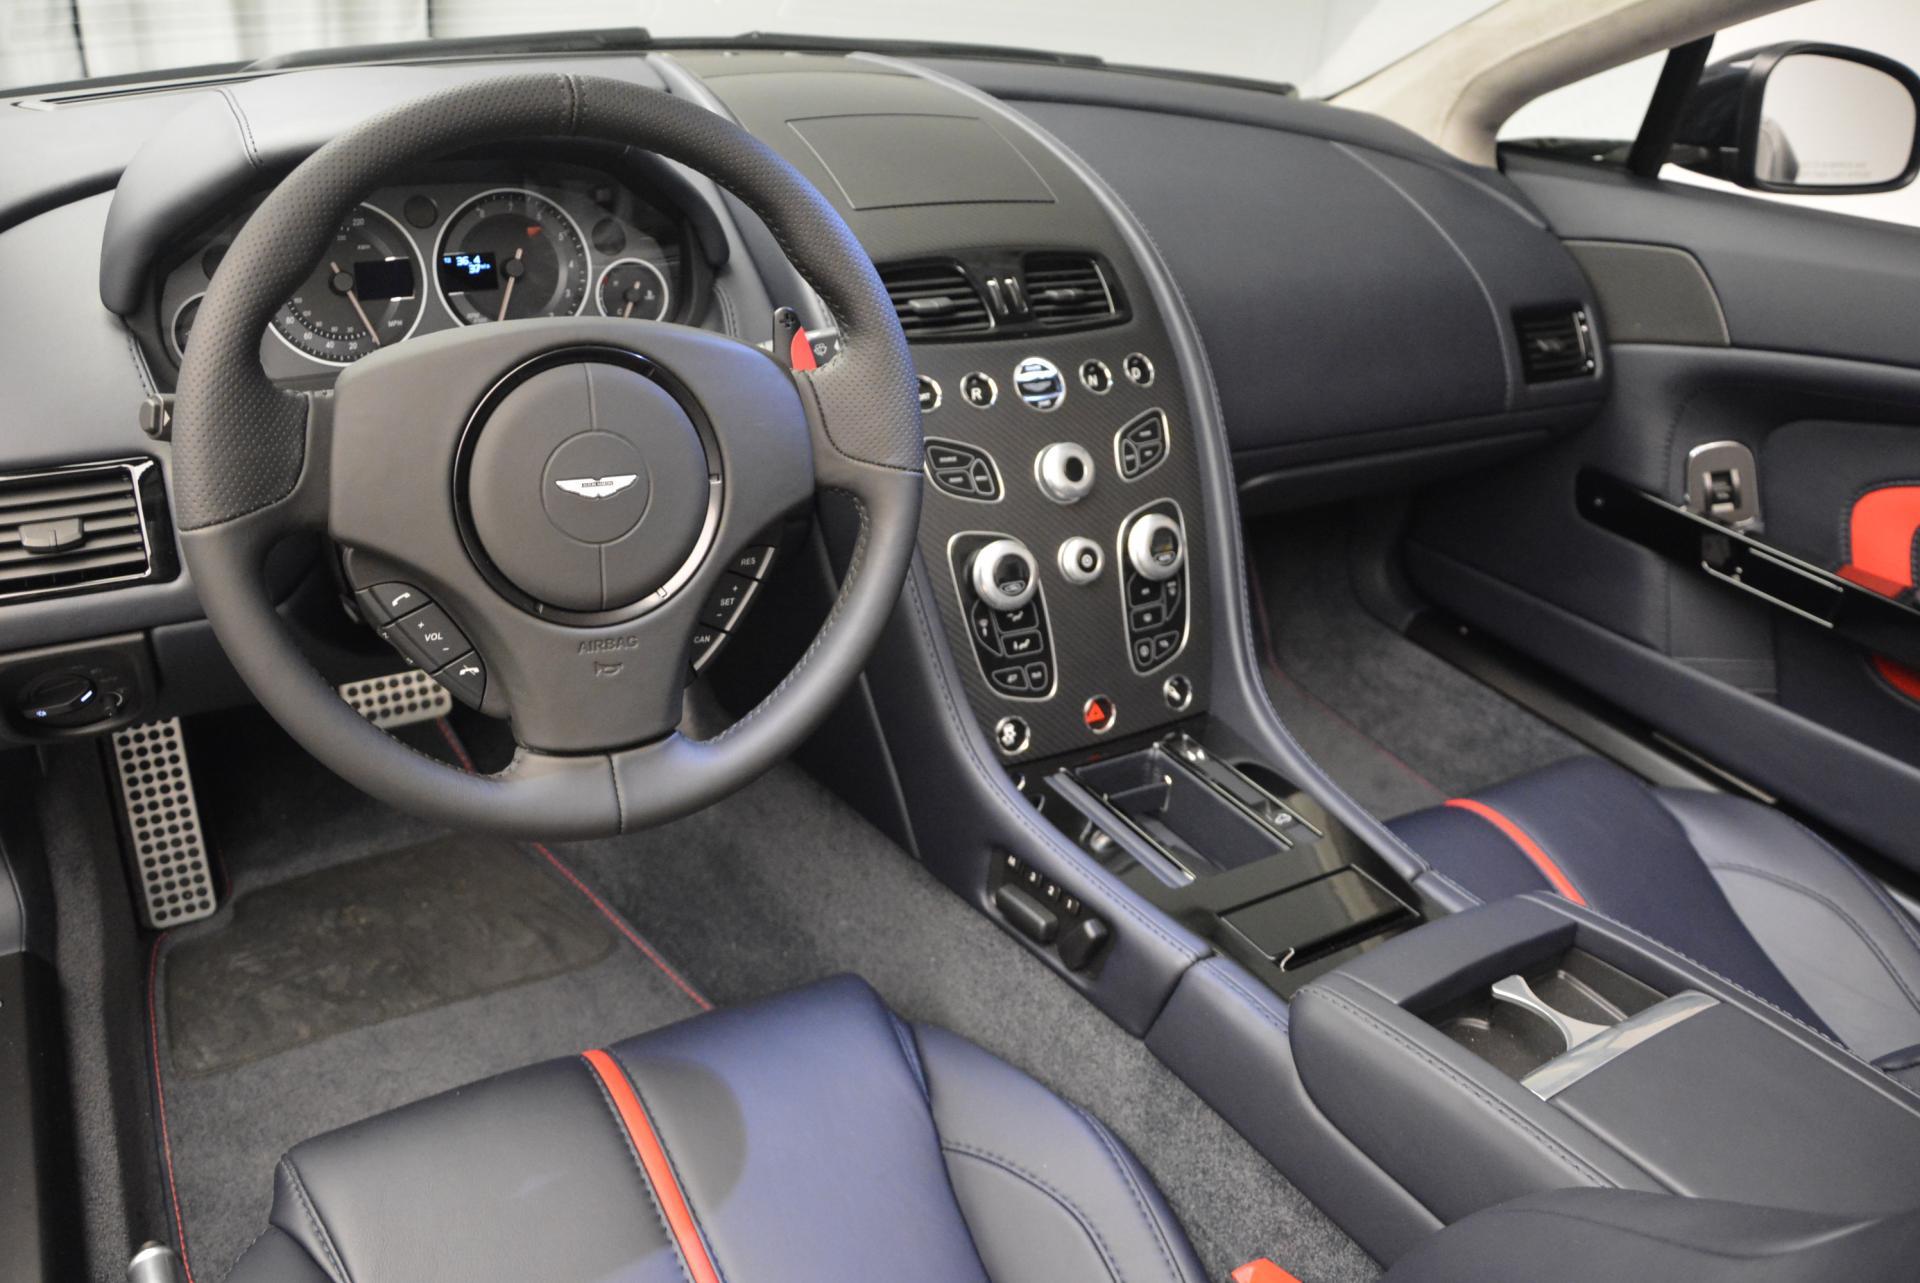 Used 2016 Aston Martin V12 Vantage S Convertible For Sale In Greenwich, CT. Alfa Romeo of Greenwich, 7579 89_p19